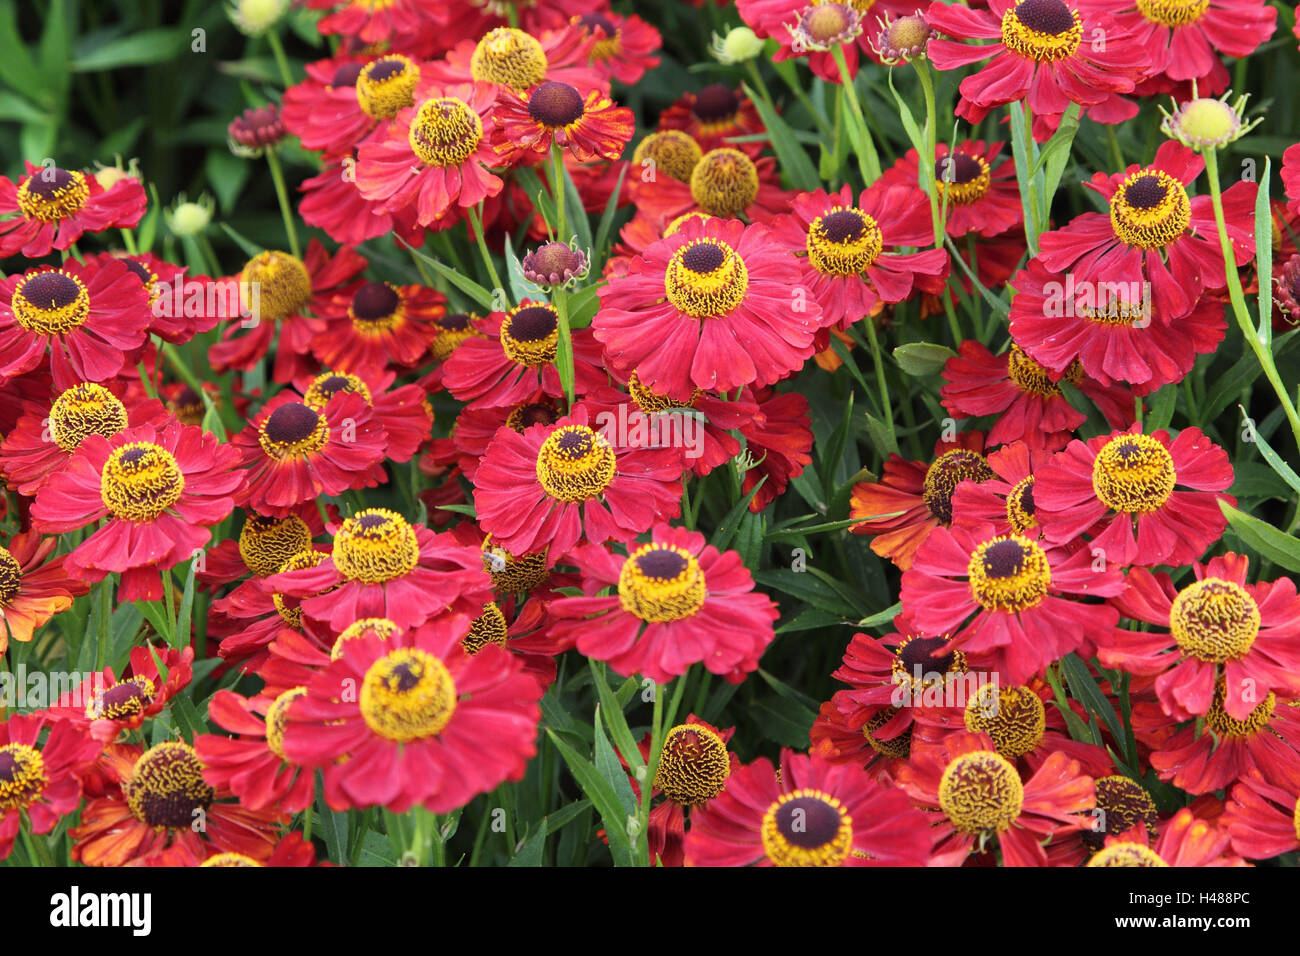 Solar bride, blossoms, landscape format, plant, flower, garden, blossom, composites, pink, Helenium, - Stock Image